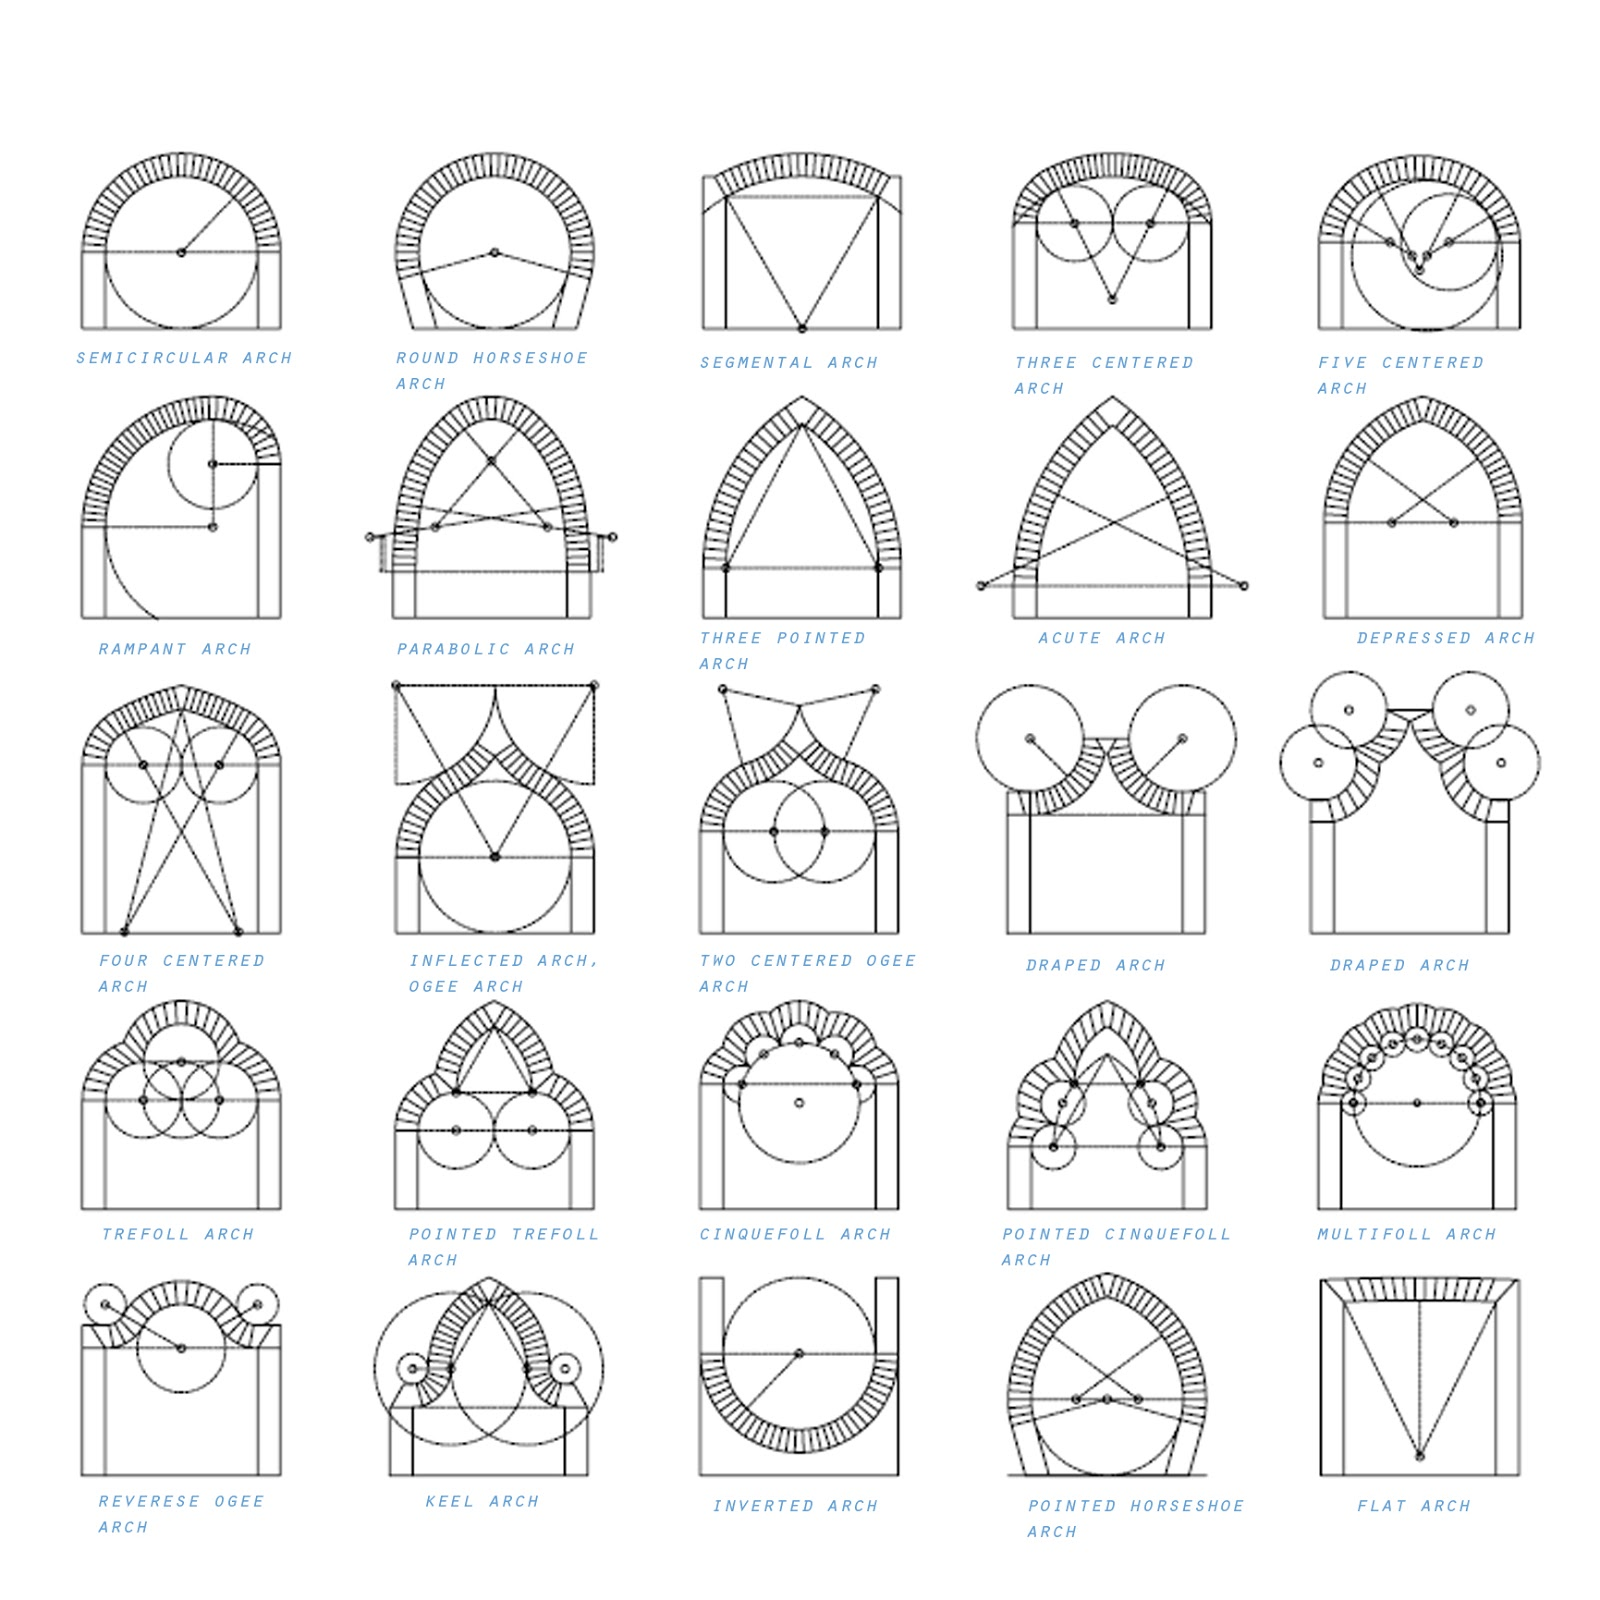 keystone arch diagram singer 401a stitch oc newbie cc first set of dungeon doors pixelart